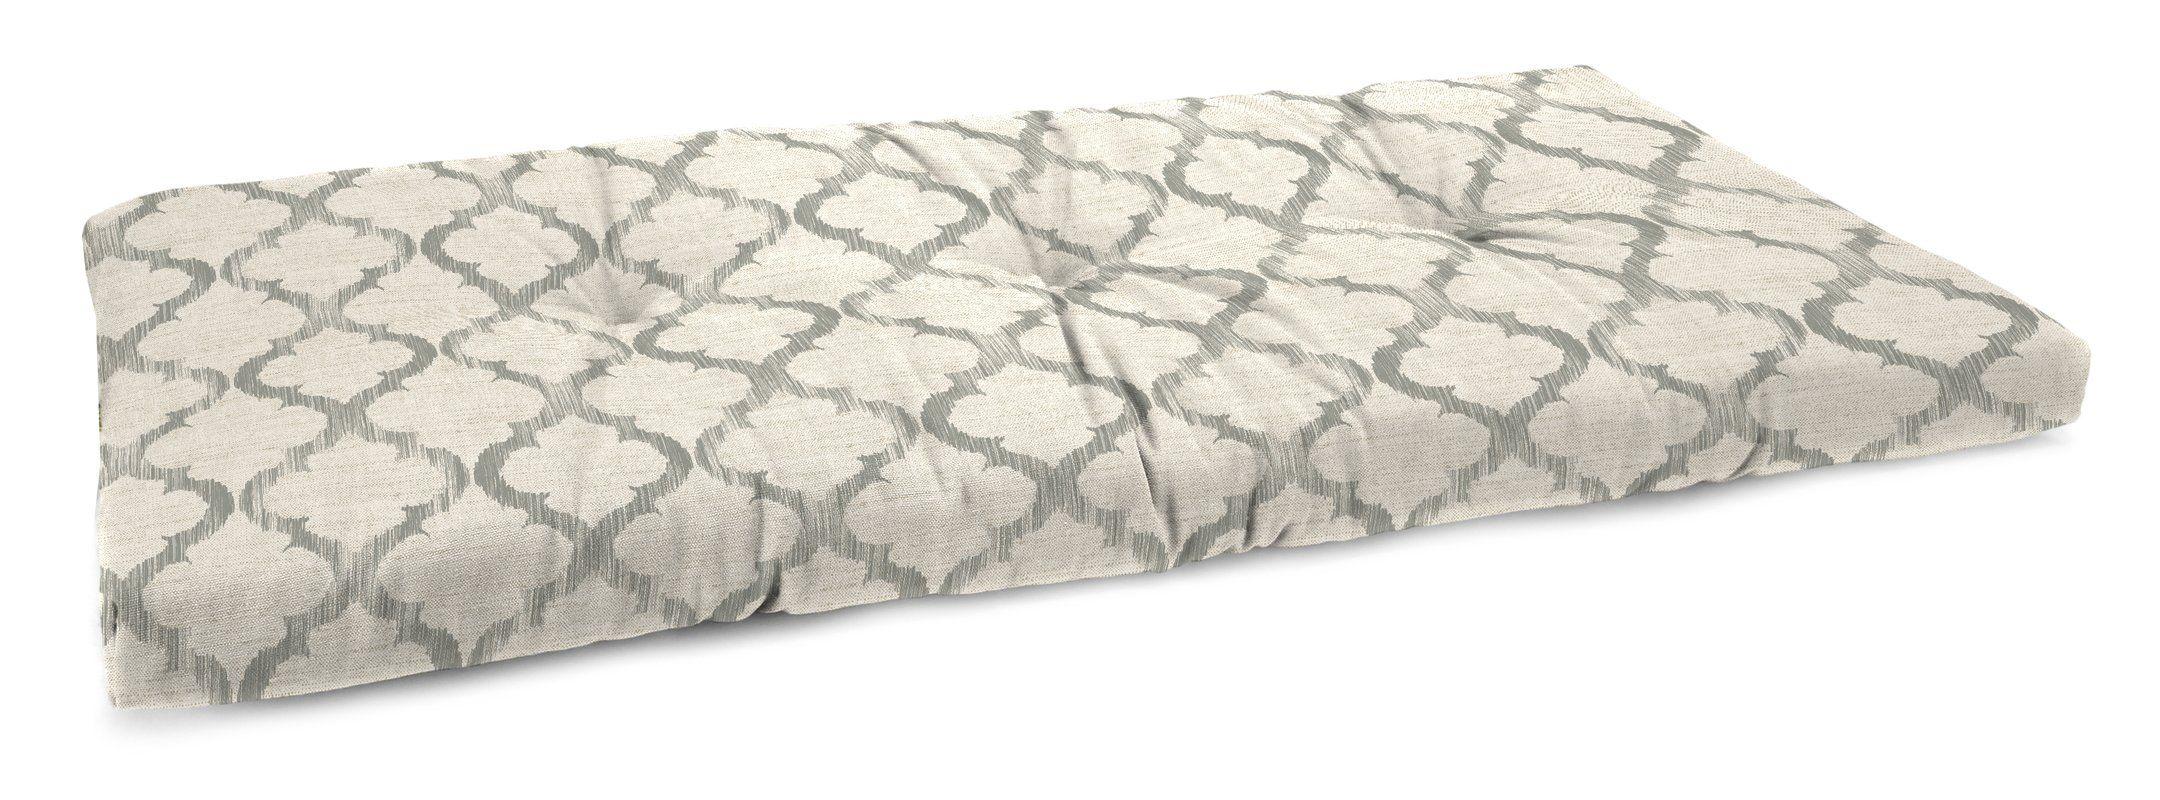 Tufted Linen Indoor Bench Cushion   Sunroom ideas   Pinterest ...